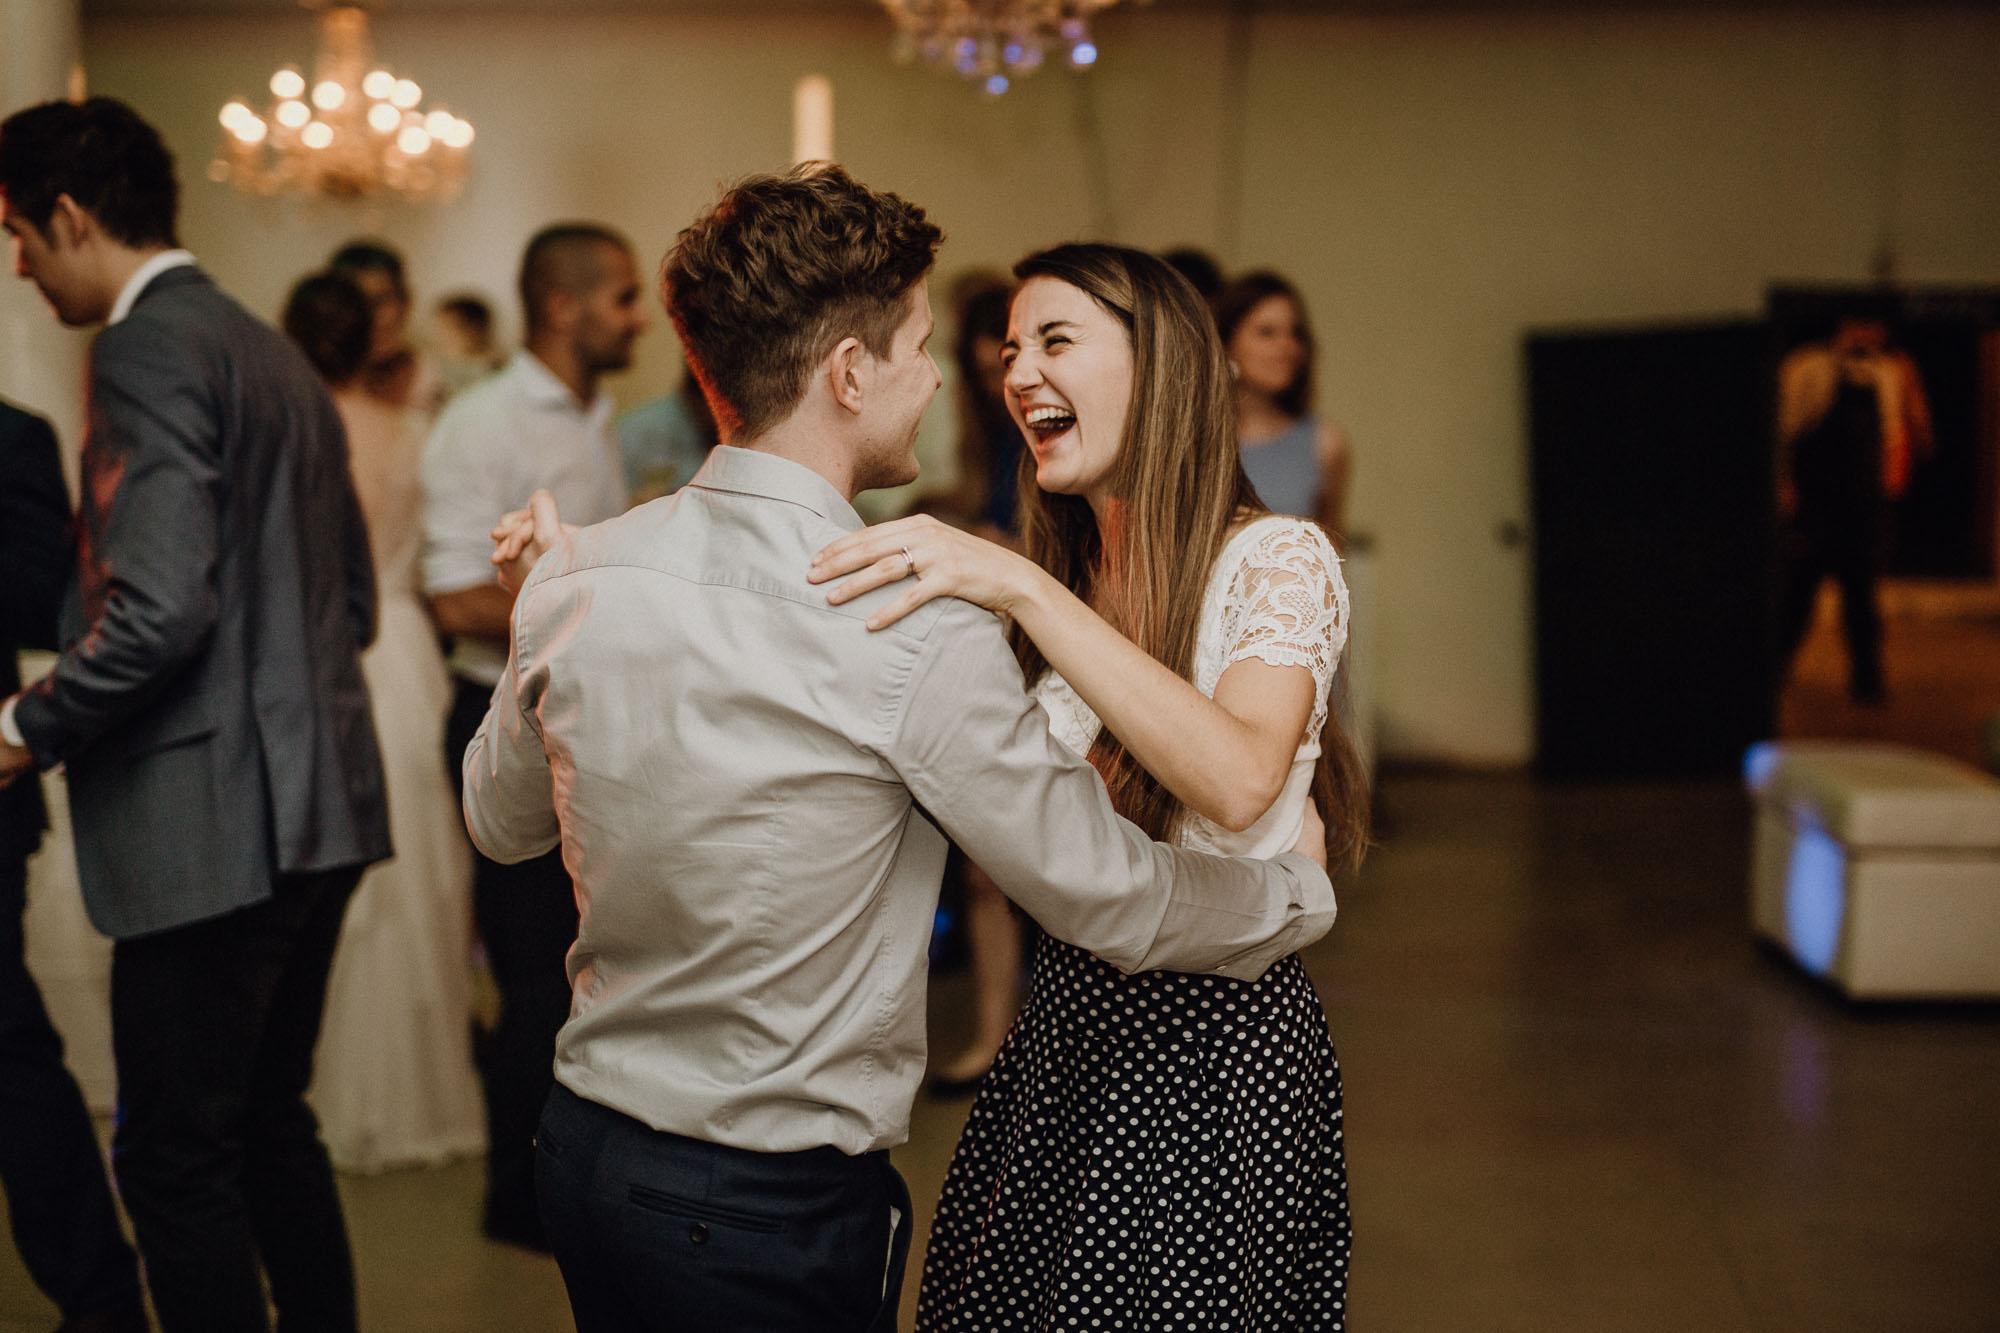 Süßes Pärchen beim Tanzen